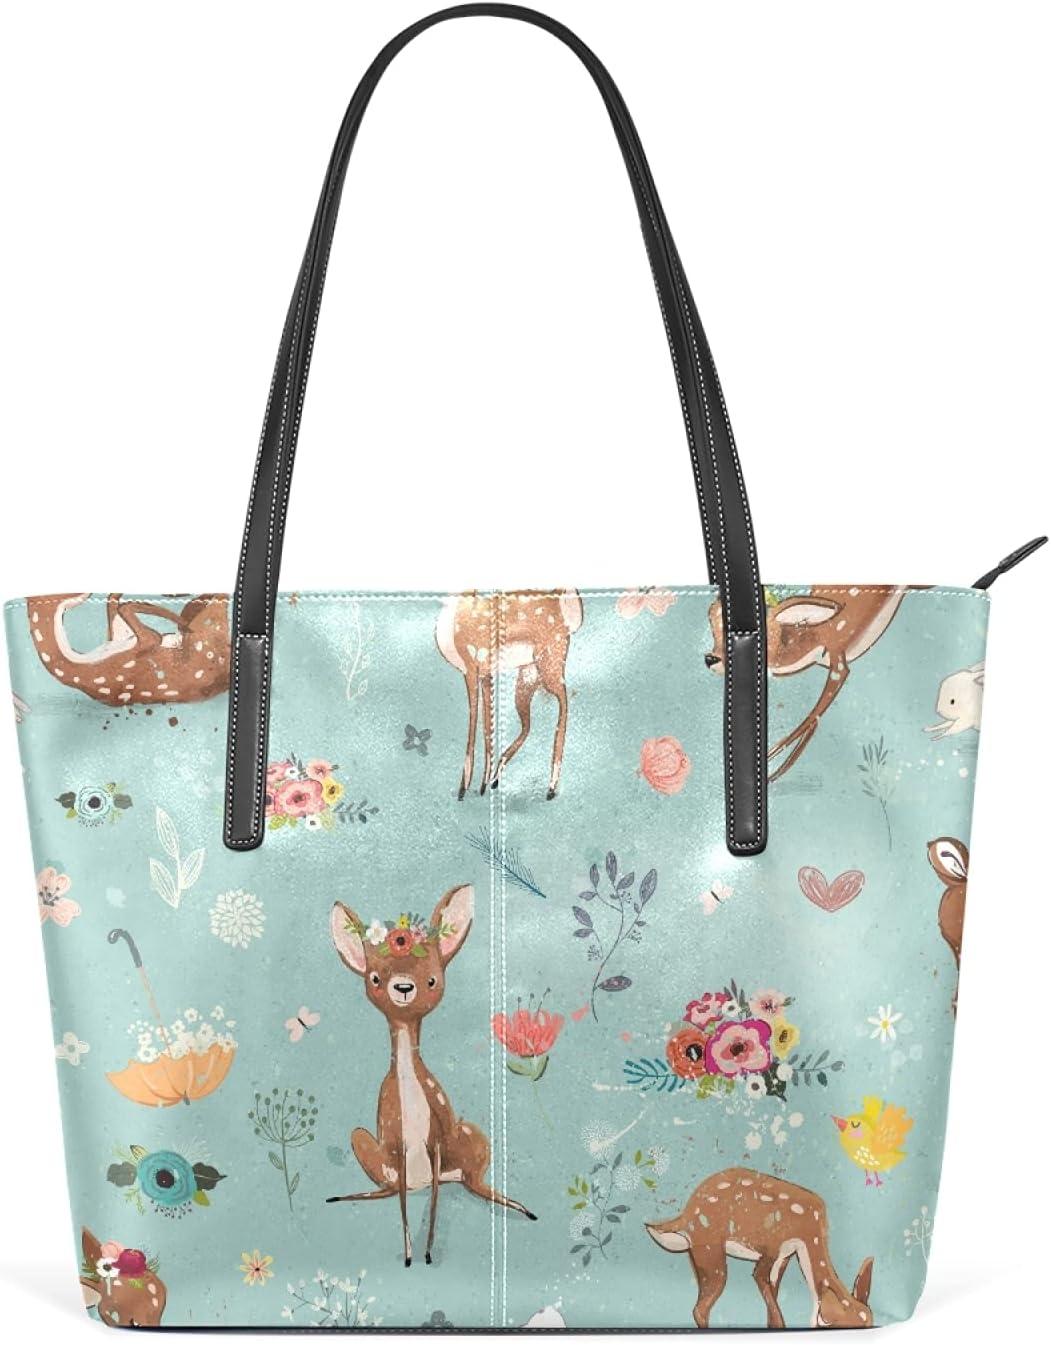 Deer And Hare Handbags Shoulder Bags Handbag f Crossbody discount Leather Rapid rise